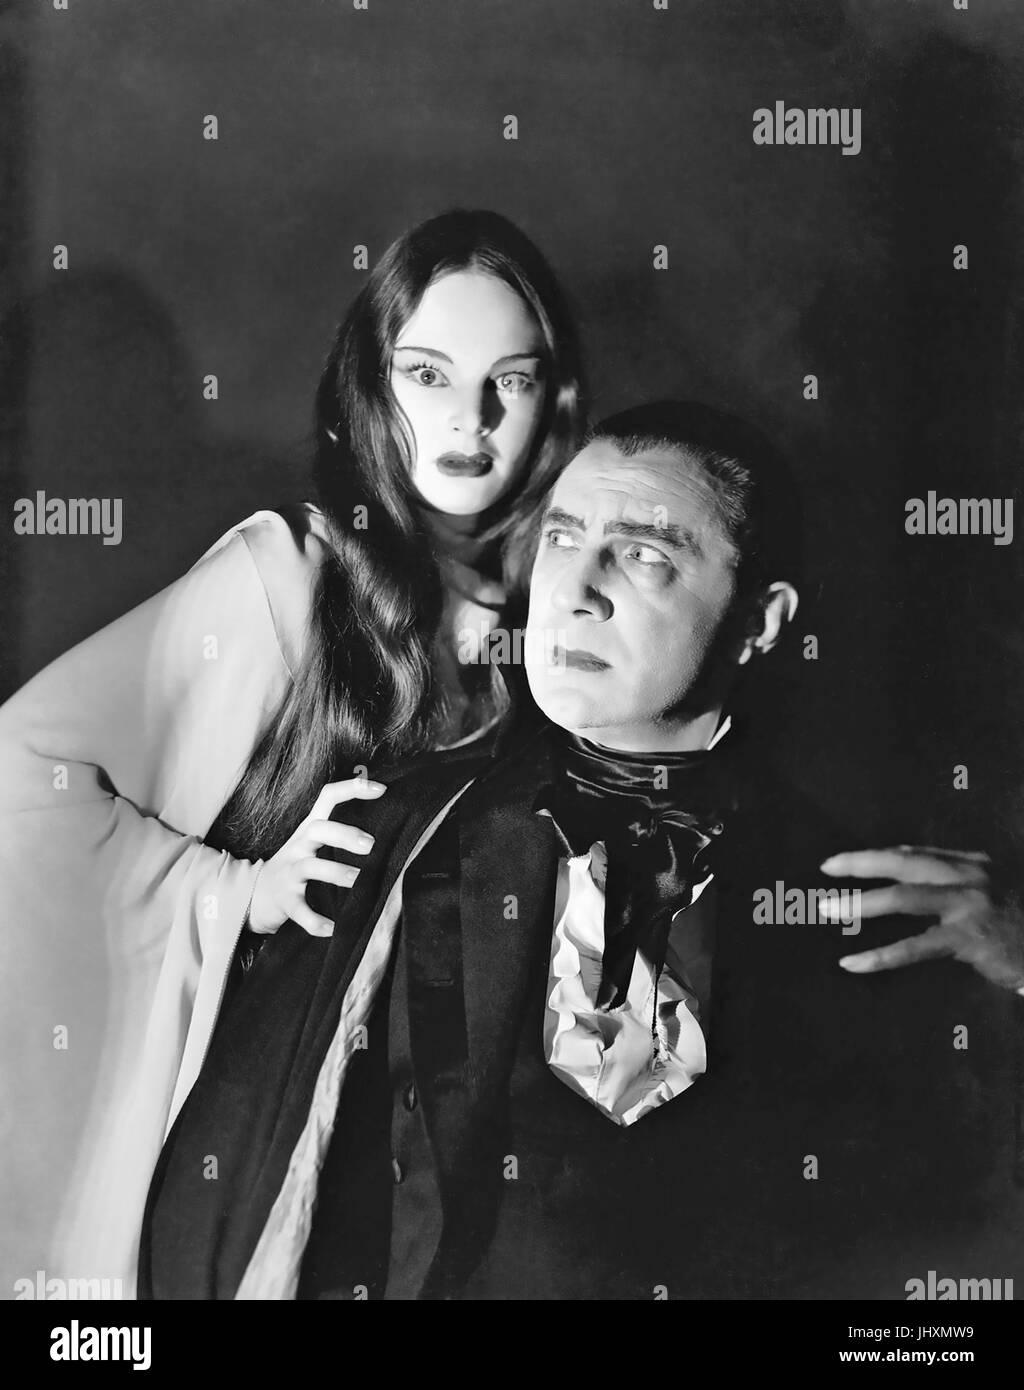 MARK OF THE VAMPIRE (aka Vampires de Prague) 1935 MGM film avec Elizabeth Allen et Bella Lugosi Banque D'Images